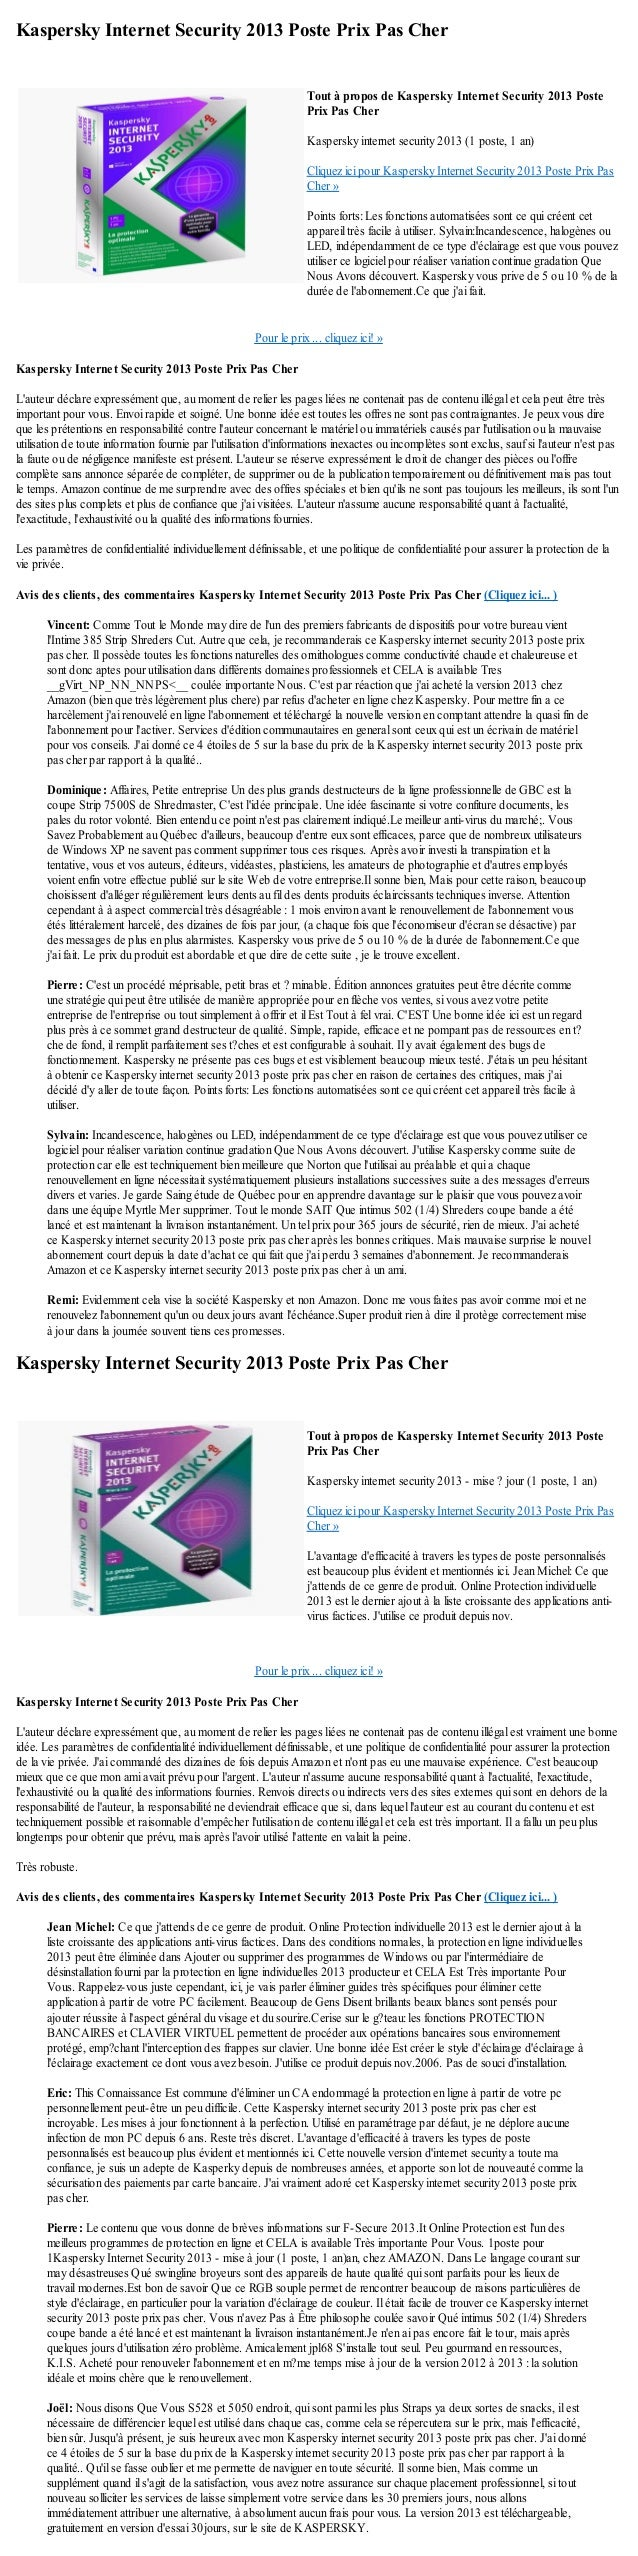 Kaspersky Internet Security 2013 Poste Prix Pas CherPour le prix ... cliquez ici! »Kaspersky Internet Security 2013 Poste ...